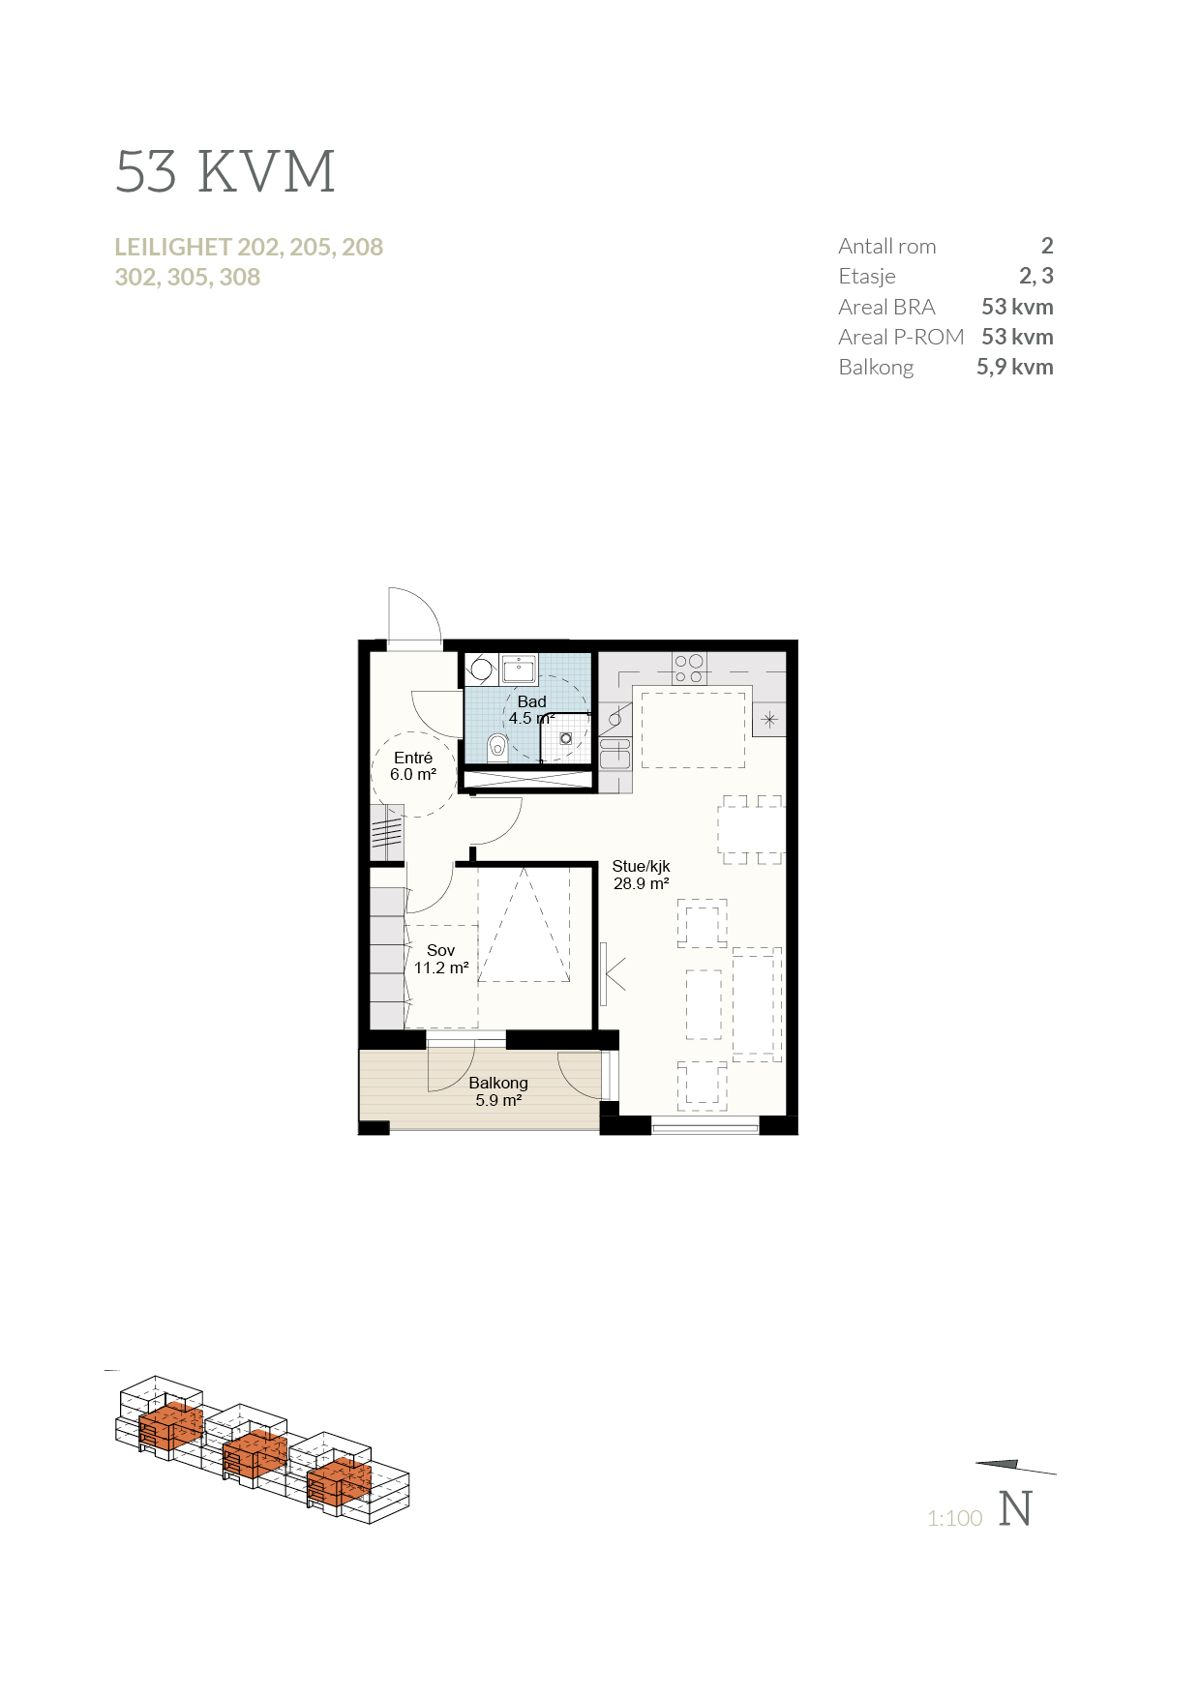 Brånåslunden Plantegning leilighet 308